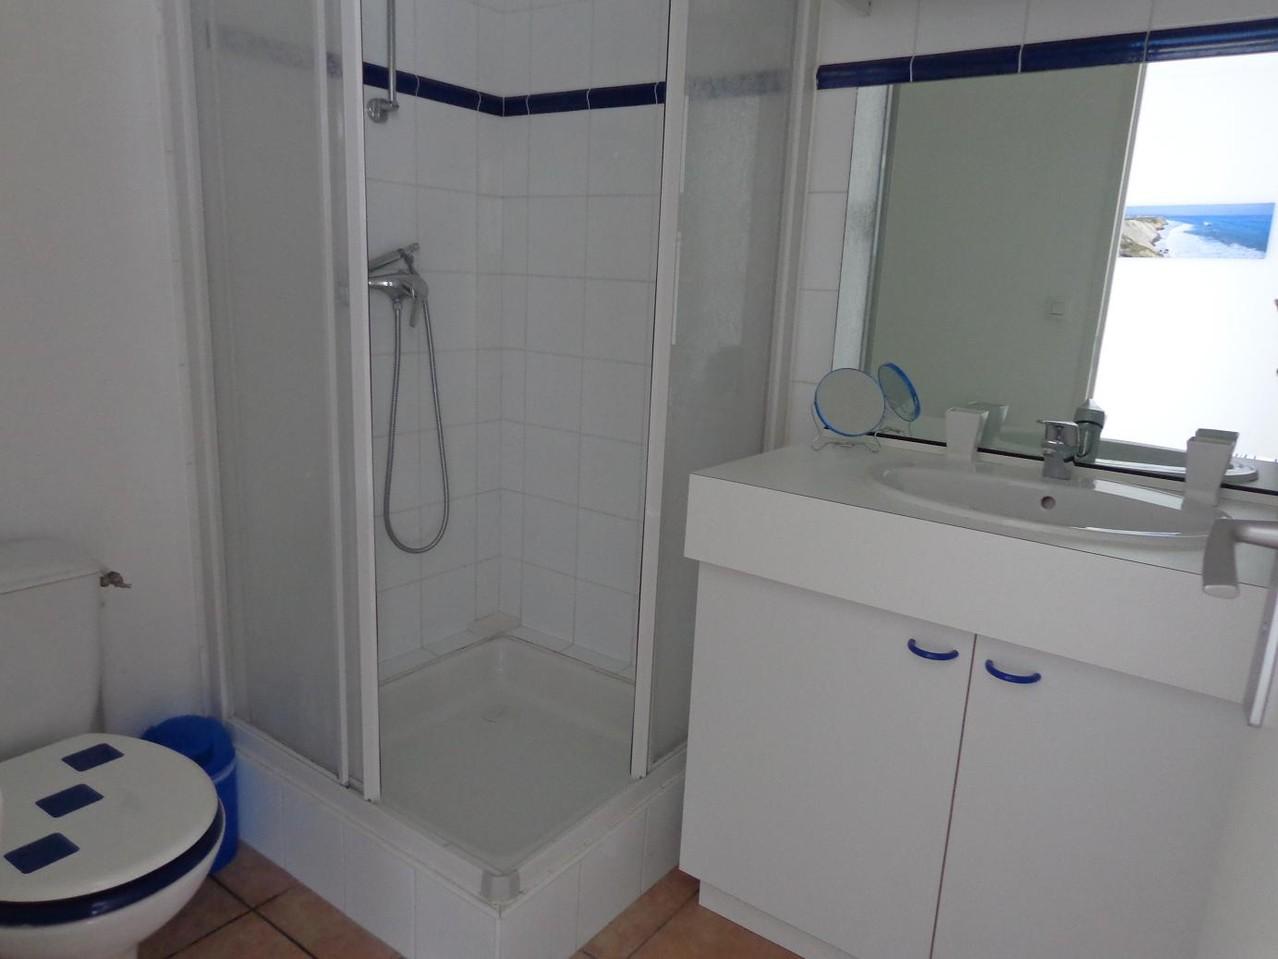 salle de bain studette océan